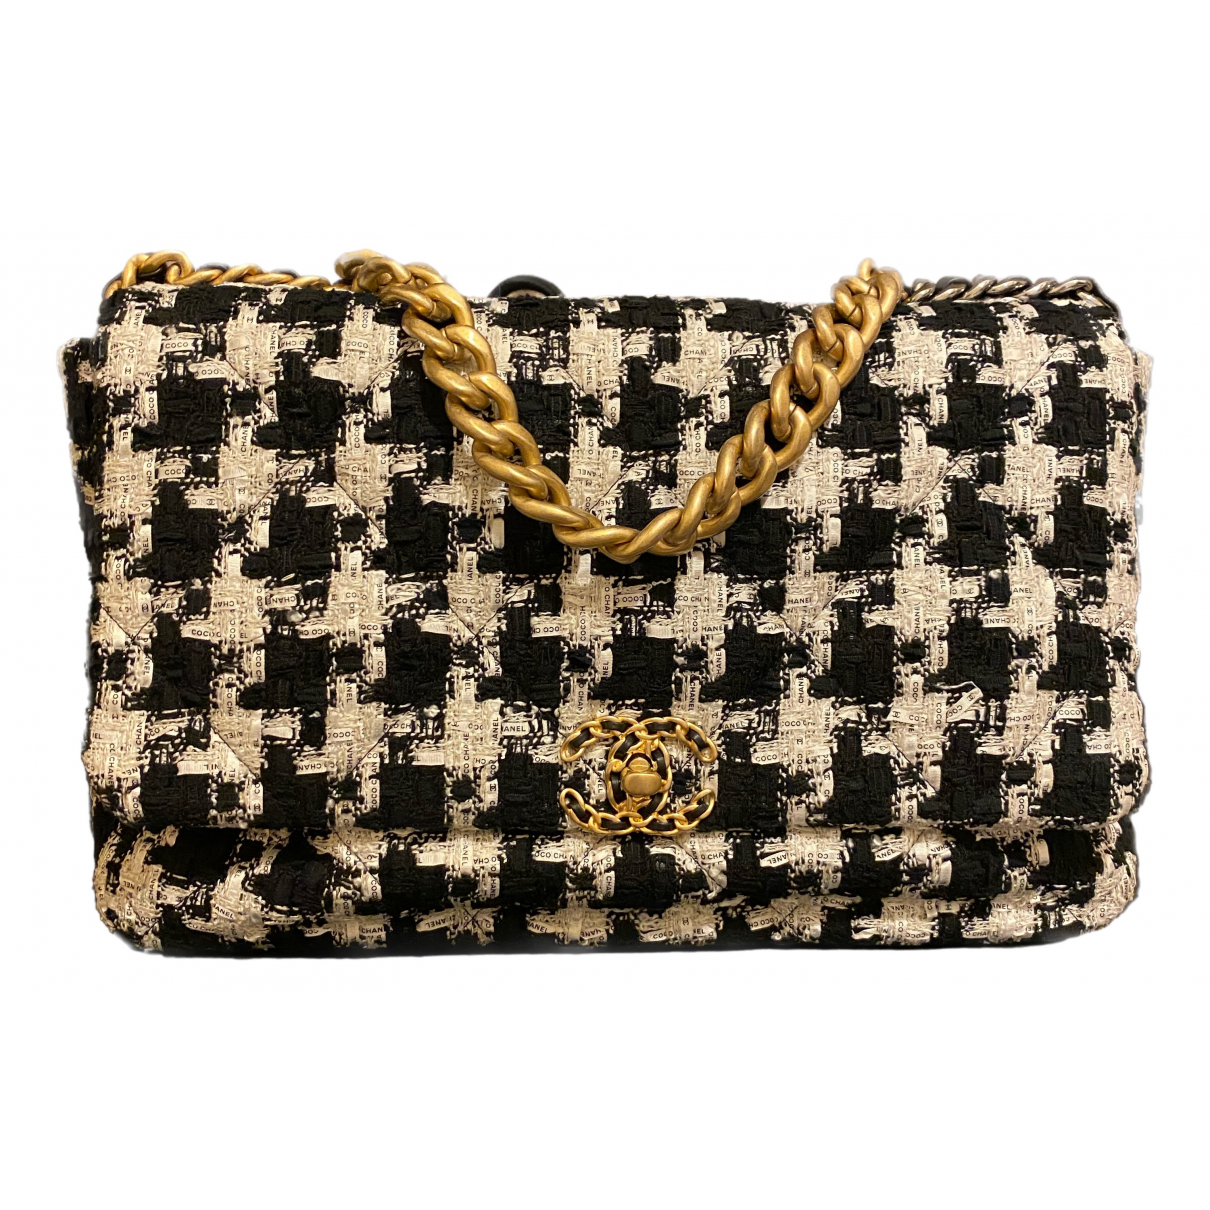 Chanel Chanel 19 Black Tweed handbag for Women N